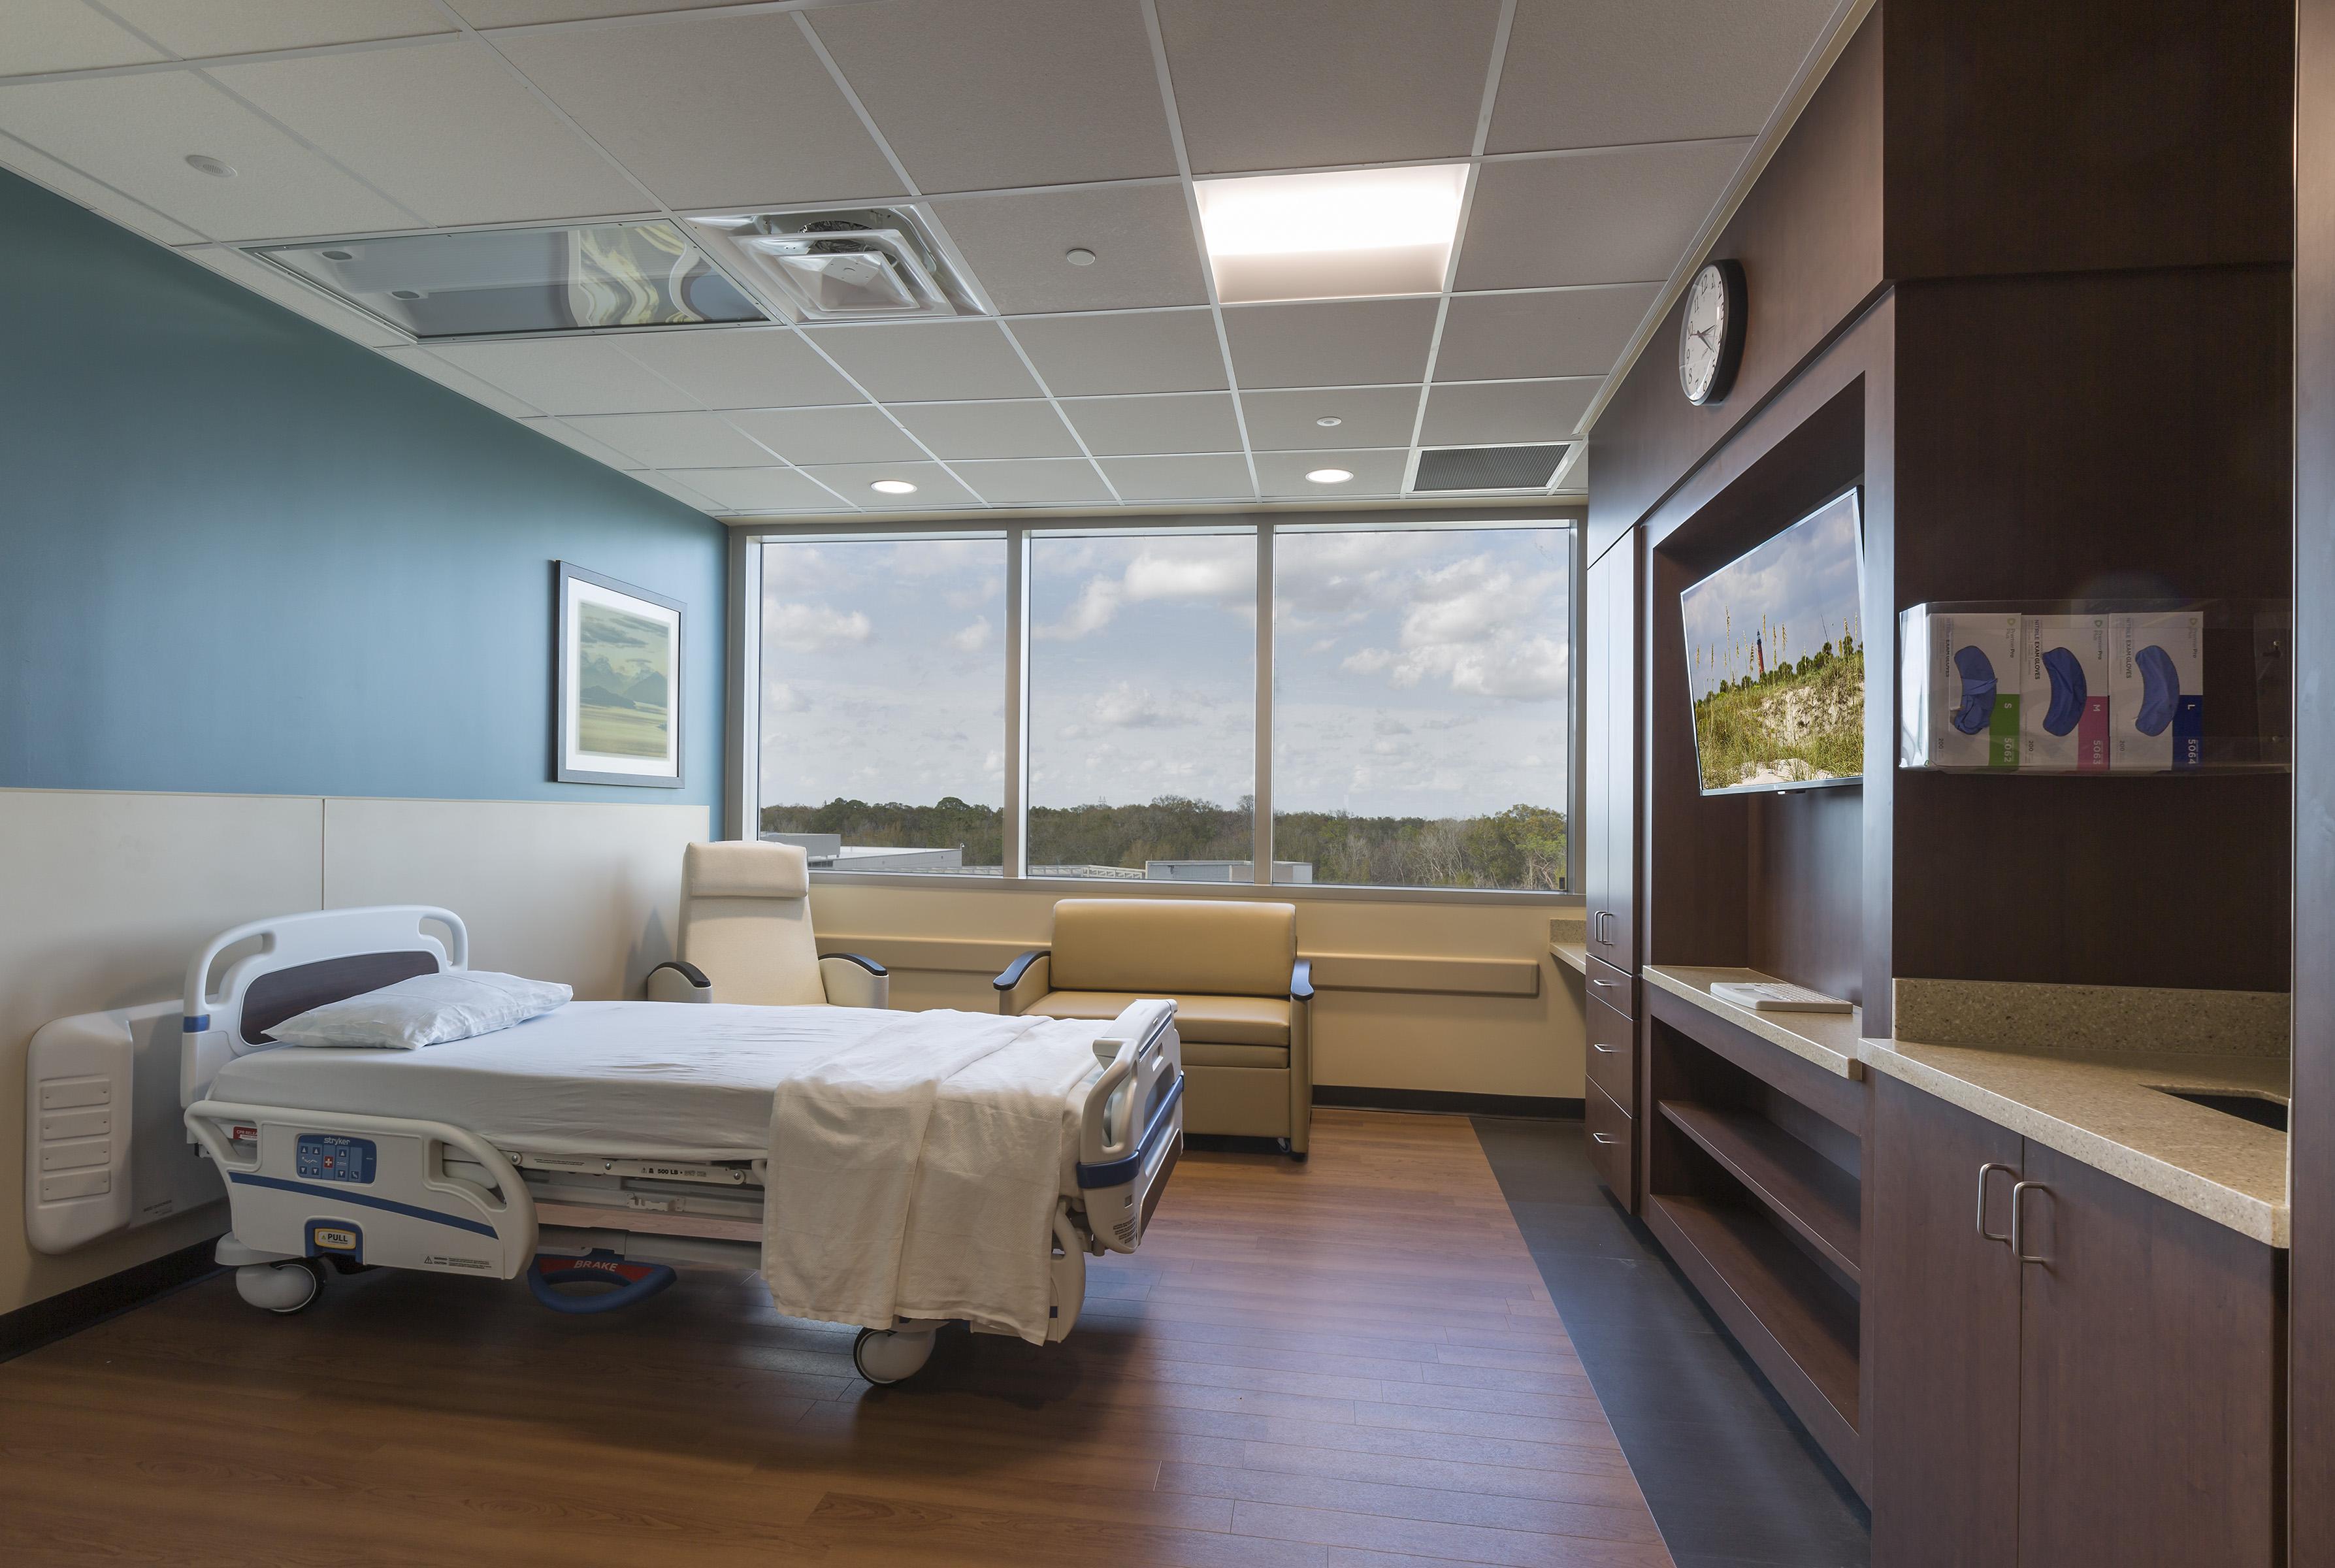 West Florida Emergency Room